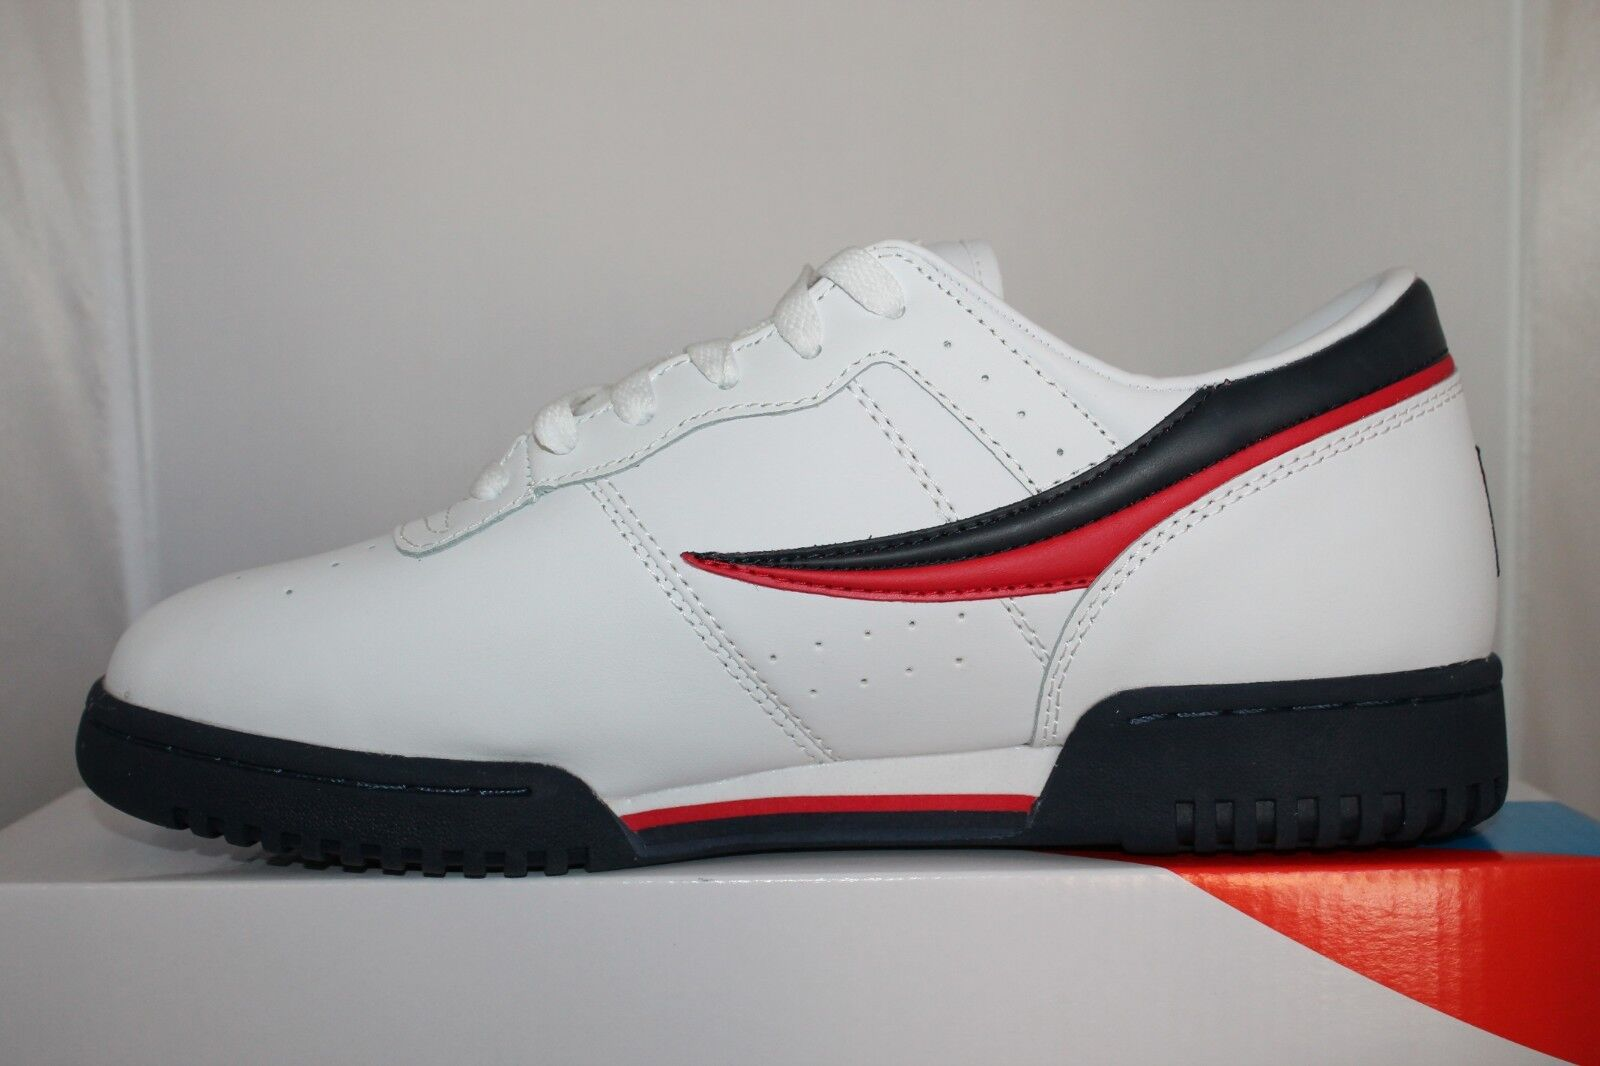 timeless design a5154 2a3b1 Mens Fila Original Fitness Classic Retro Casual Athletic Shoes White Navy  Red - inkFrog